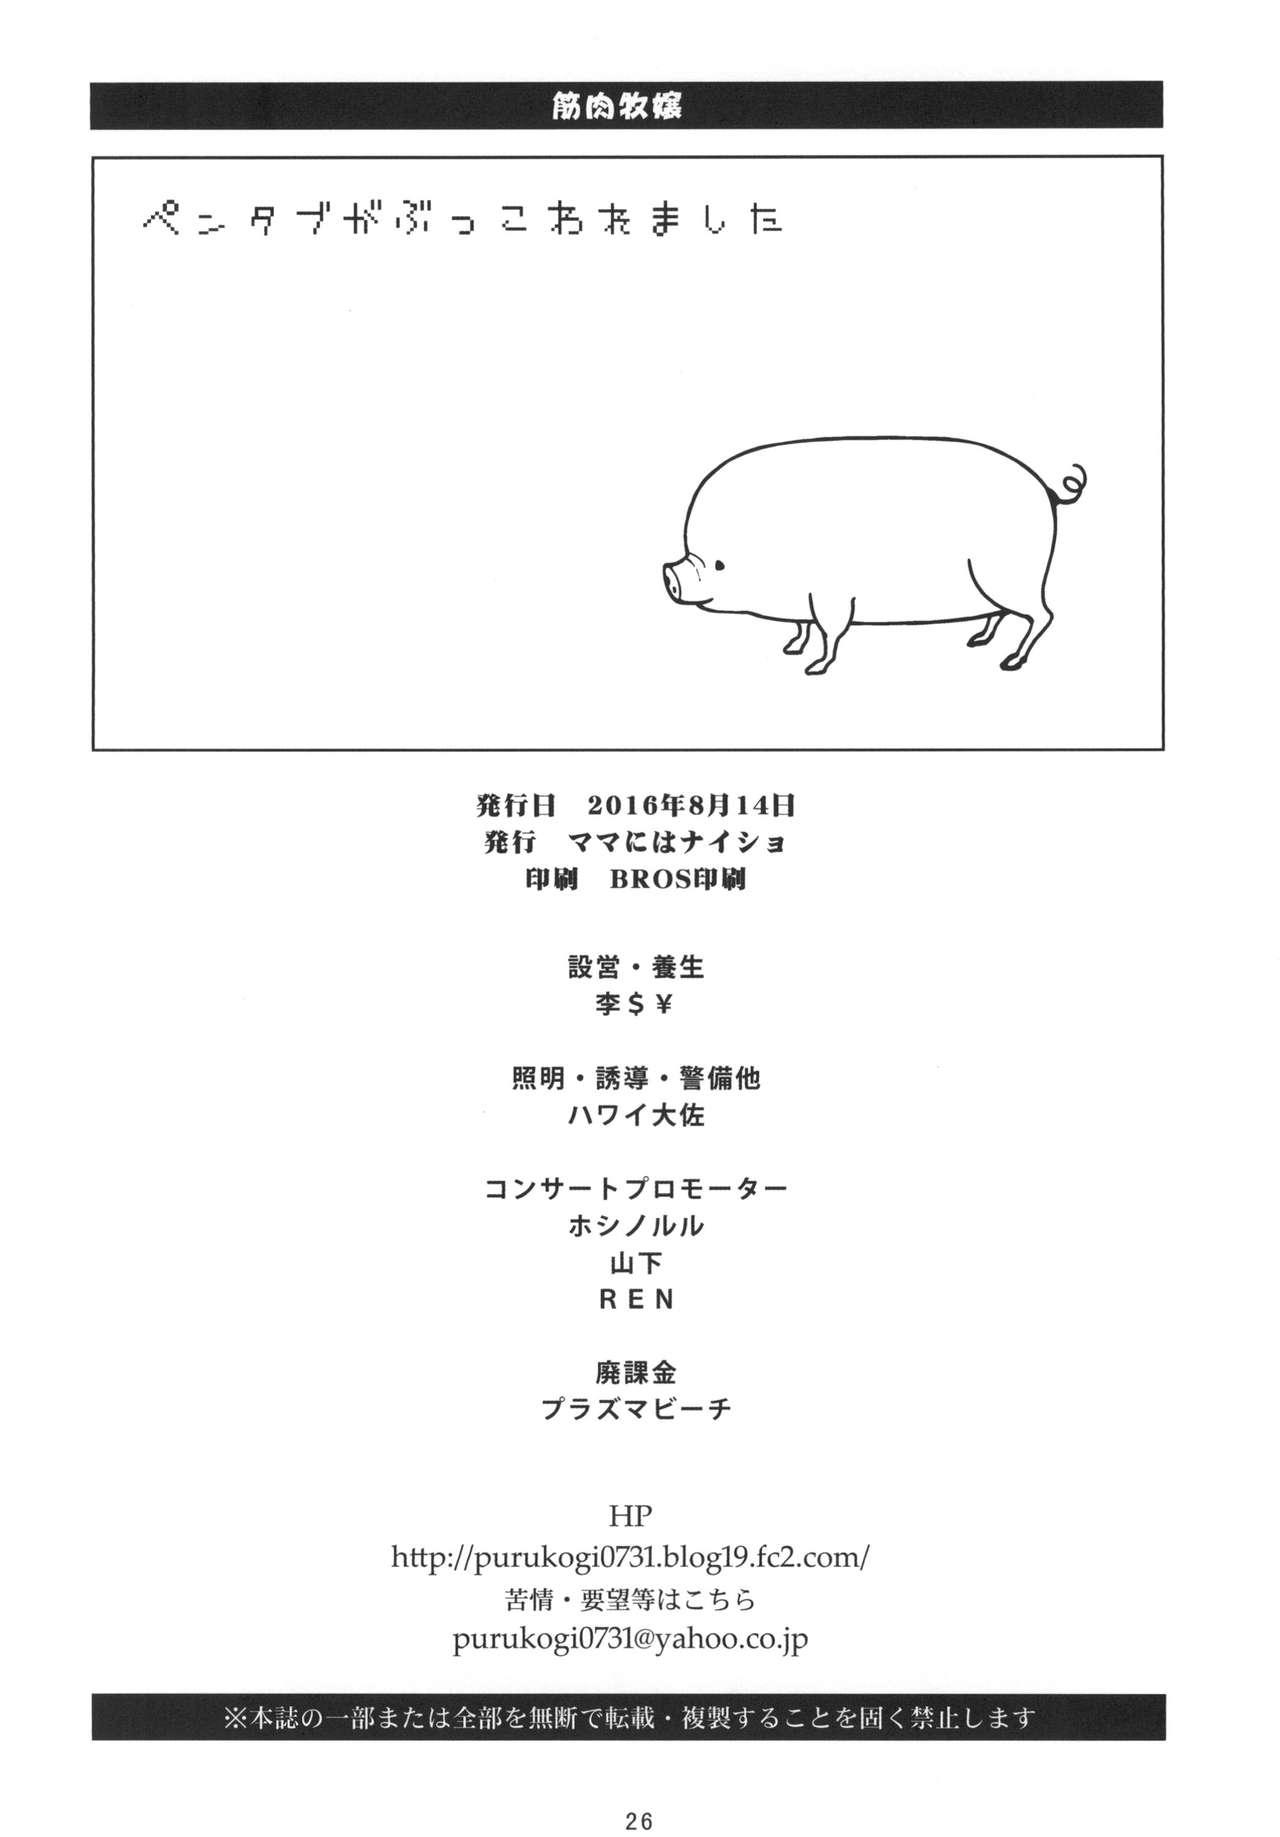 Kinniku Bokujou 25